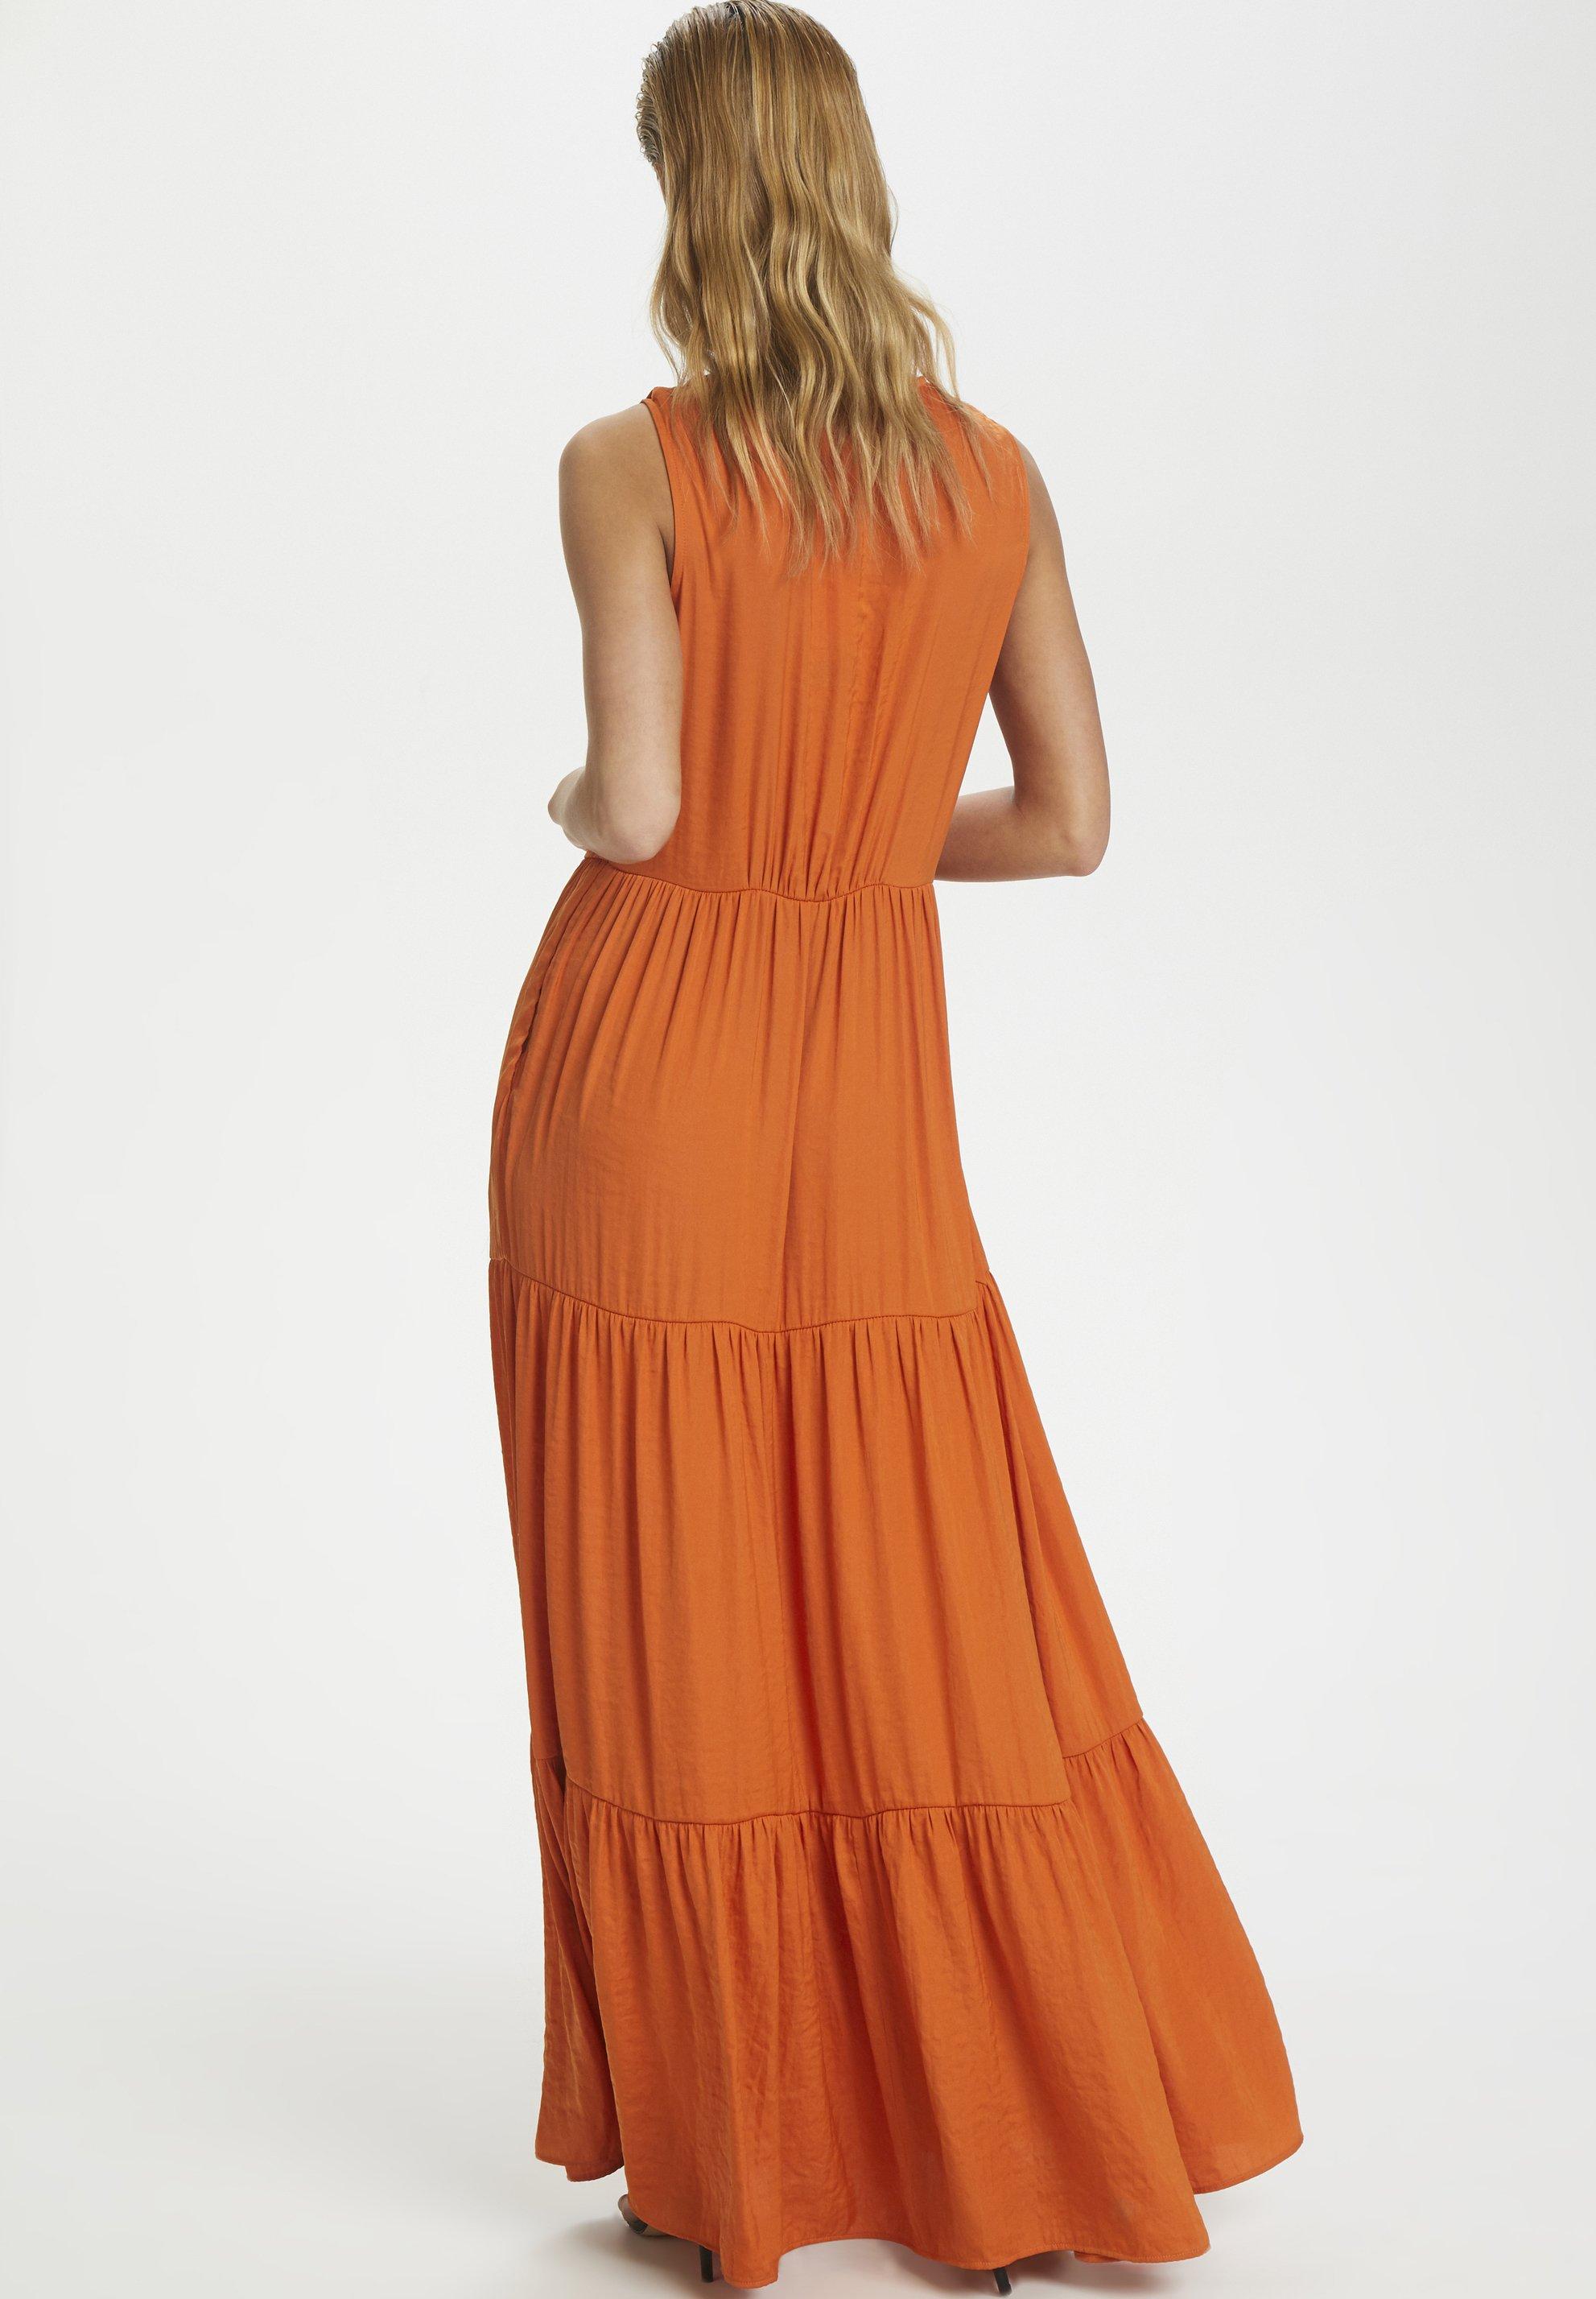 Soaked In Luxury Slkellan Maxi Dress - Vestito Lungo Burnt Orange x33C0SB